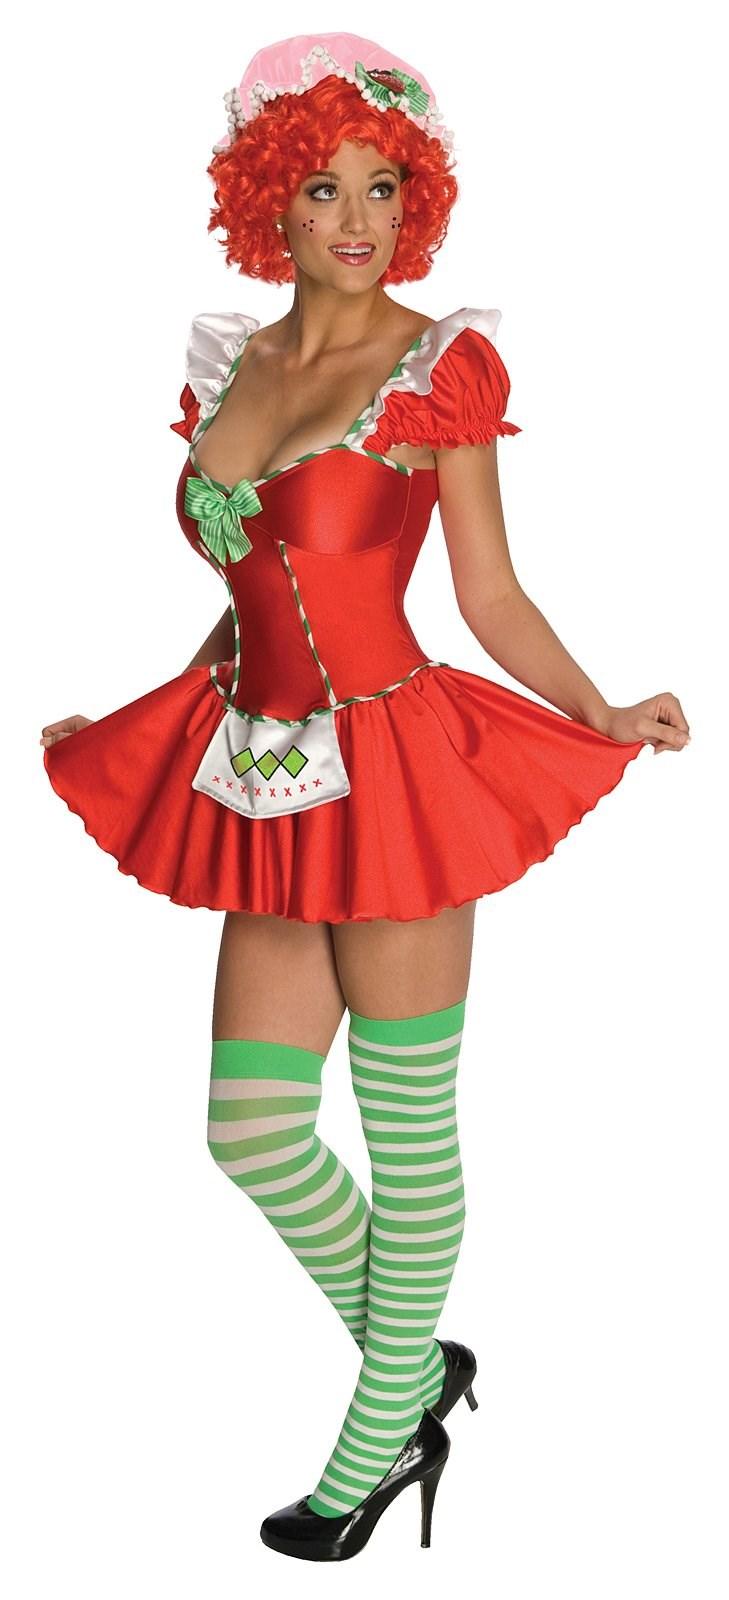 Strawberry Shortcake Adult Costume - Clearance Size XS